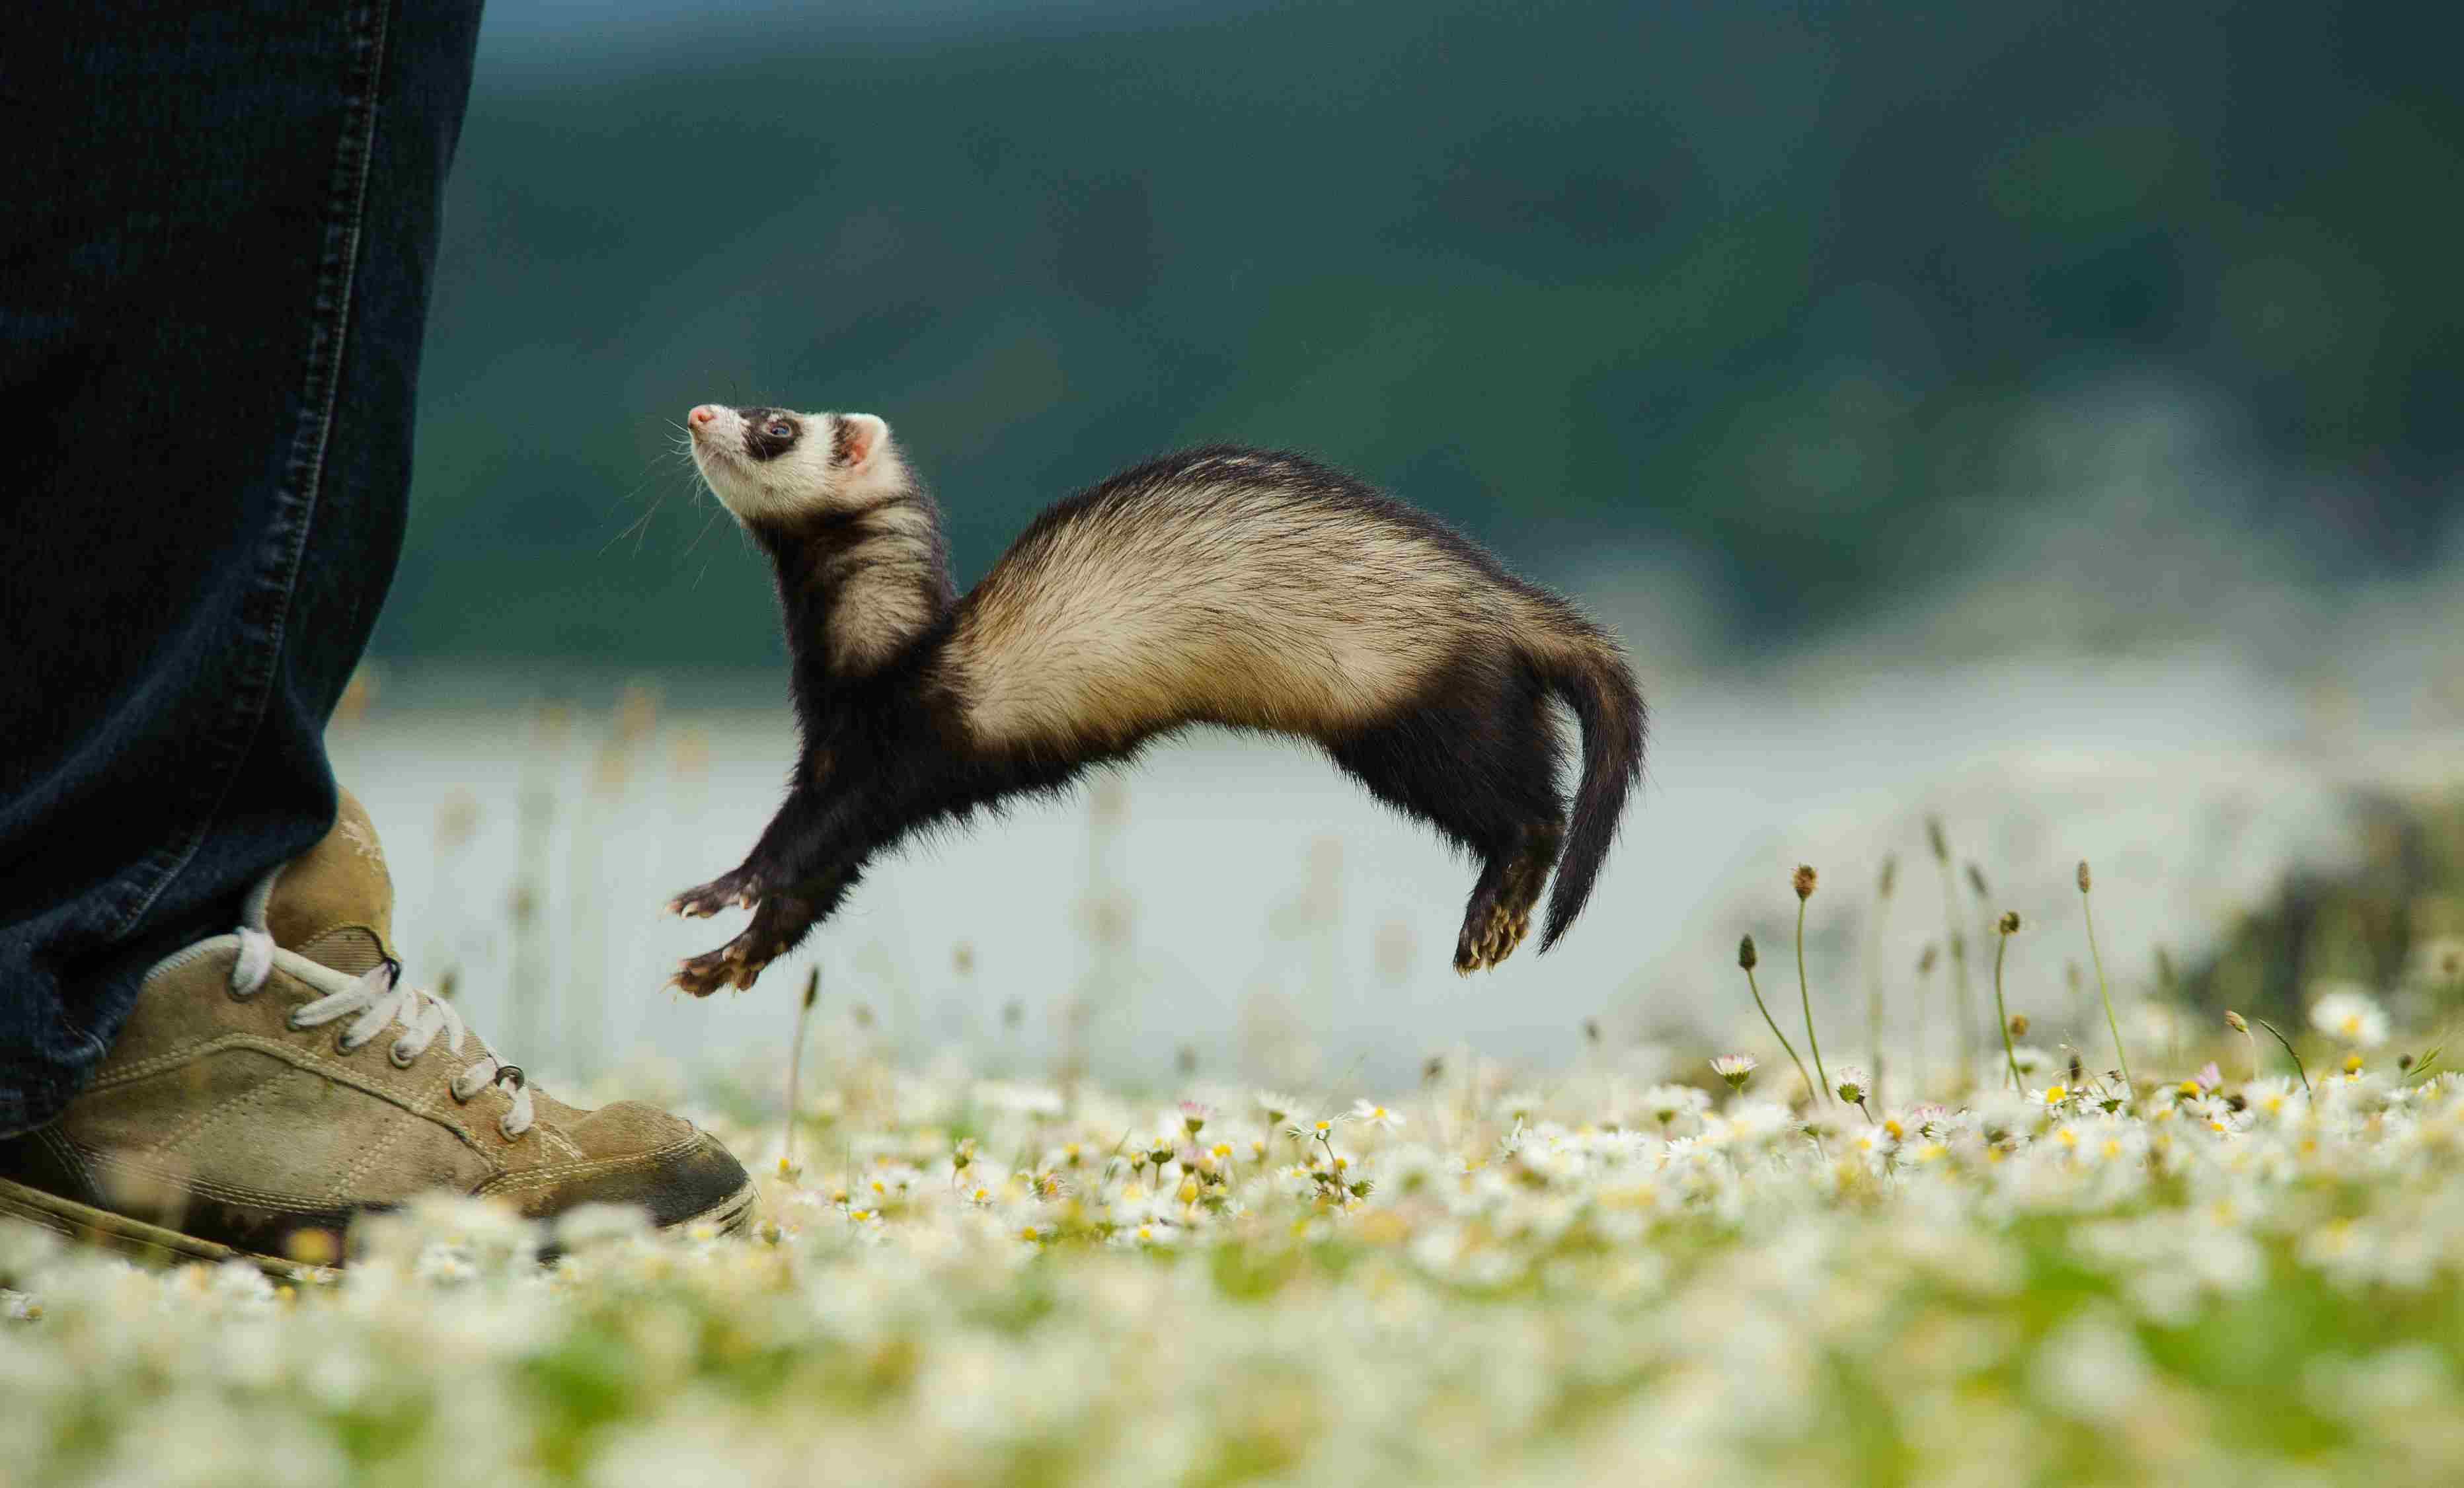 The weasel war dance or